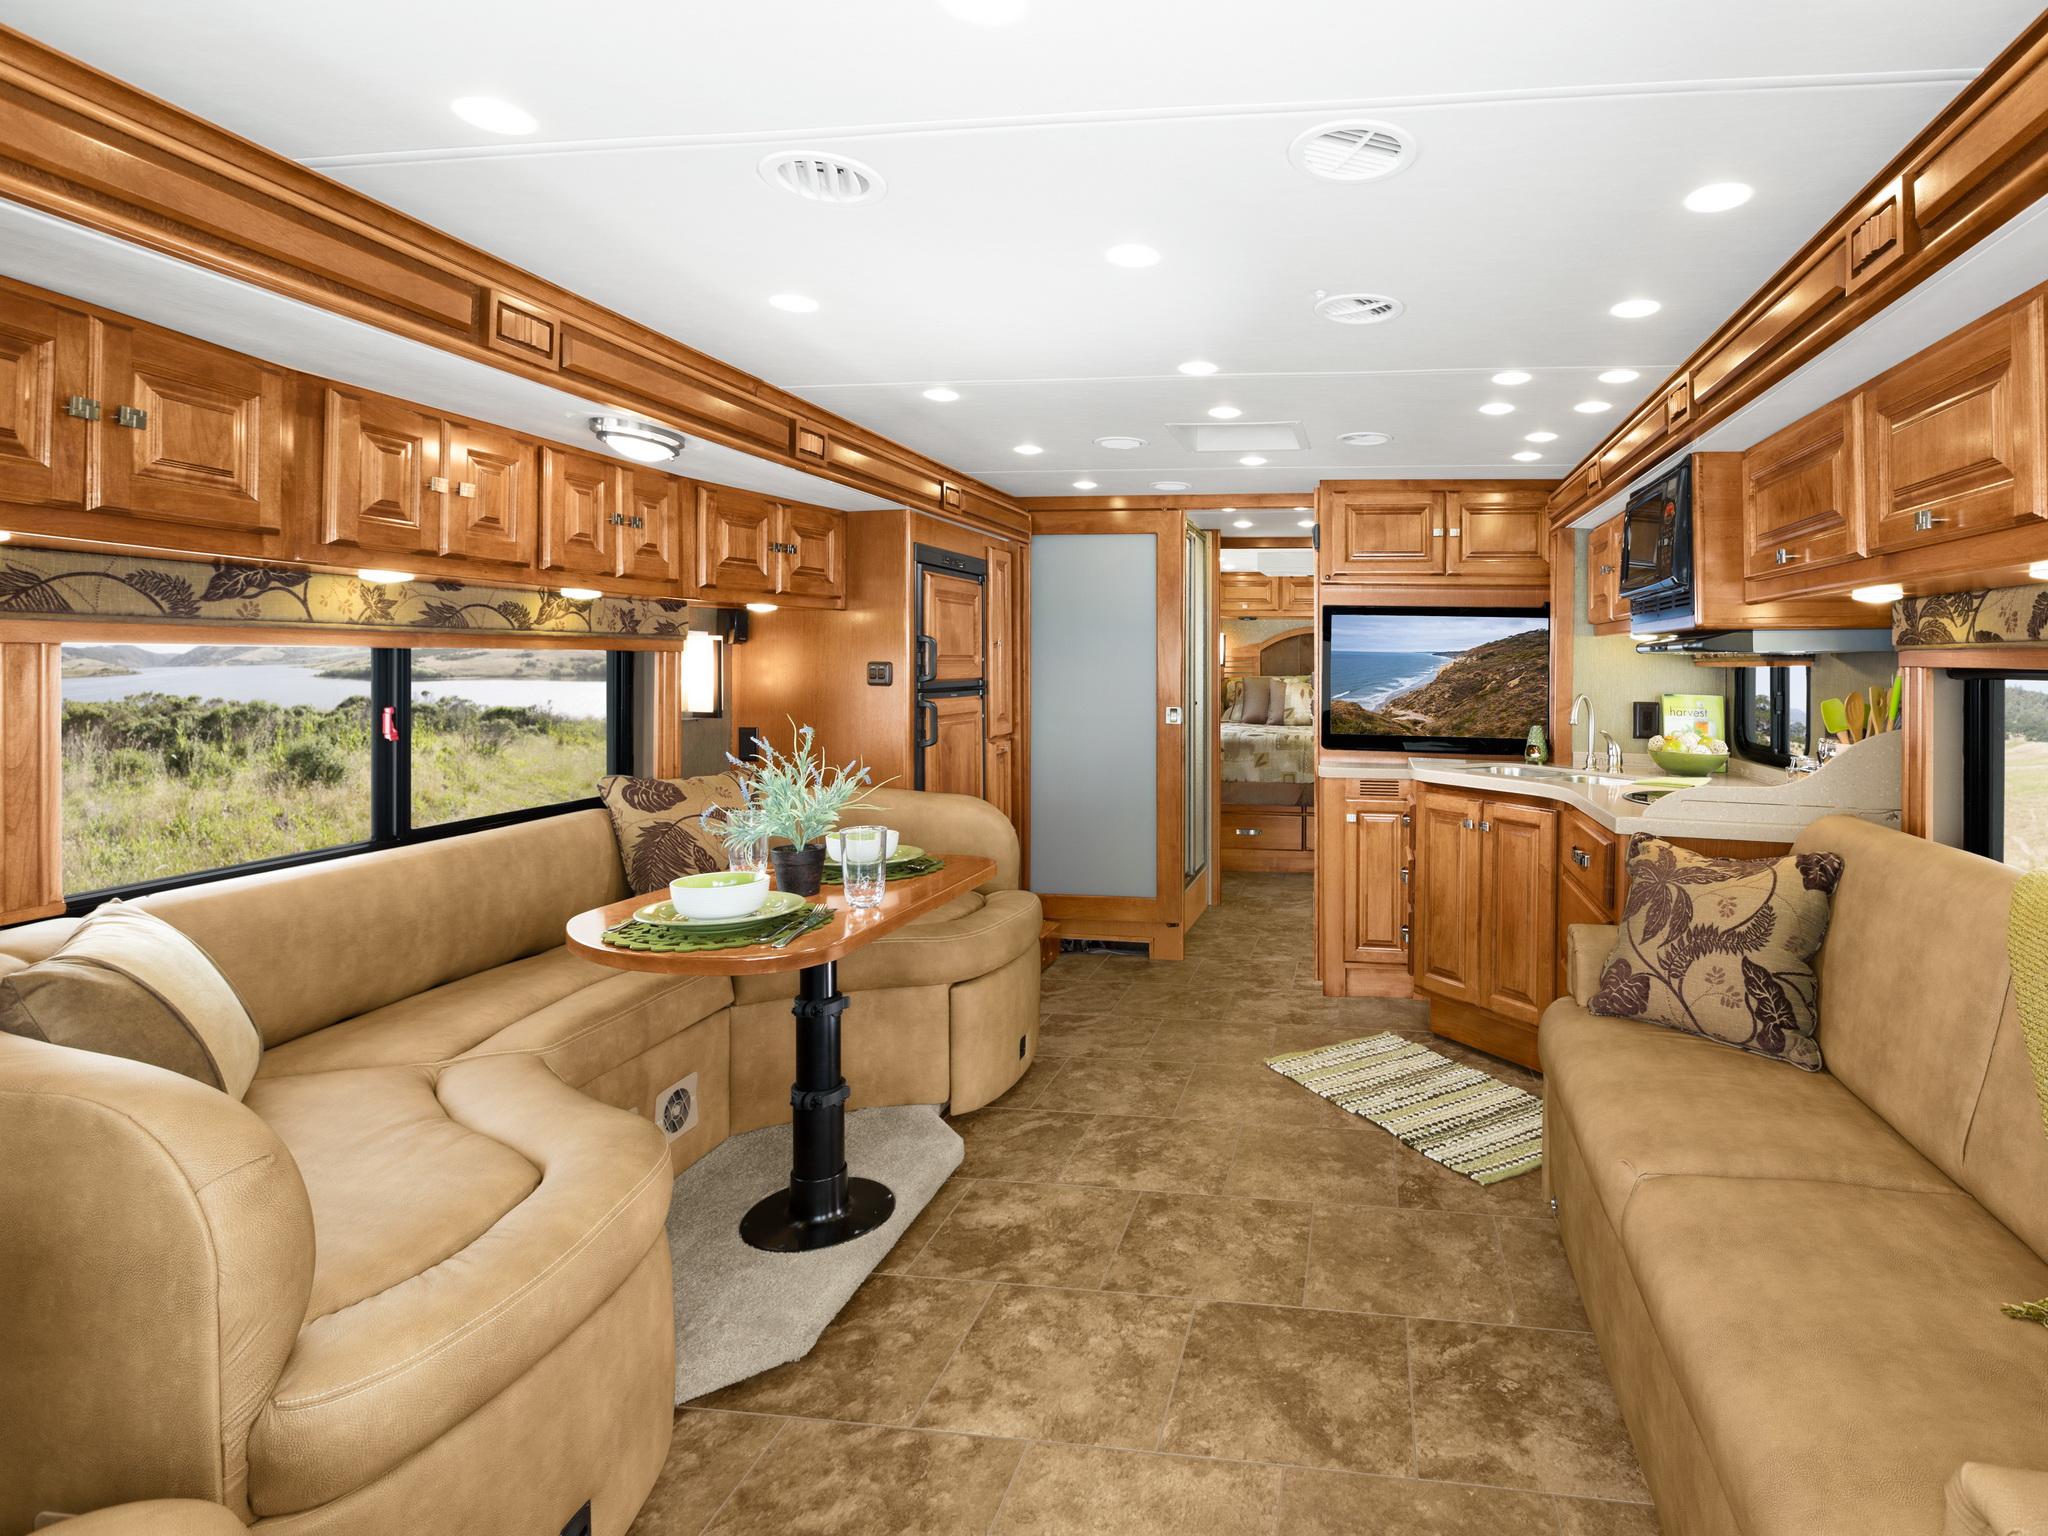 2011 Tiffin Allegro Breeze Motorhome Camper Interior G